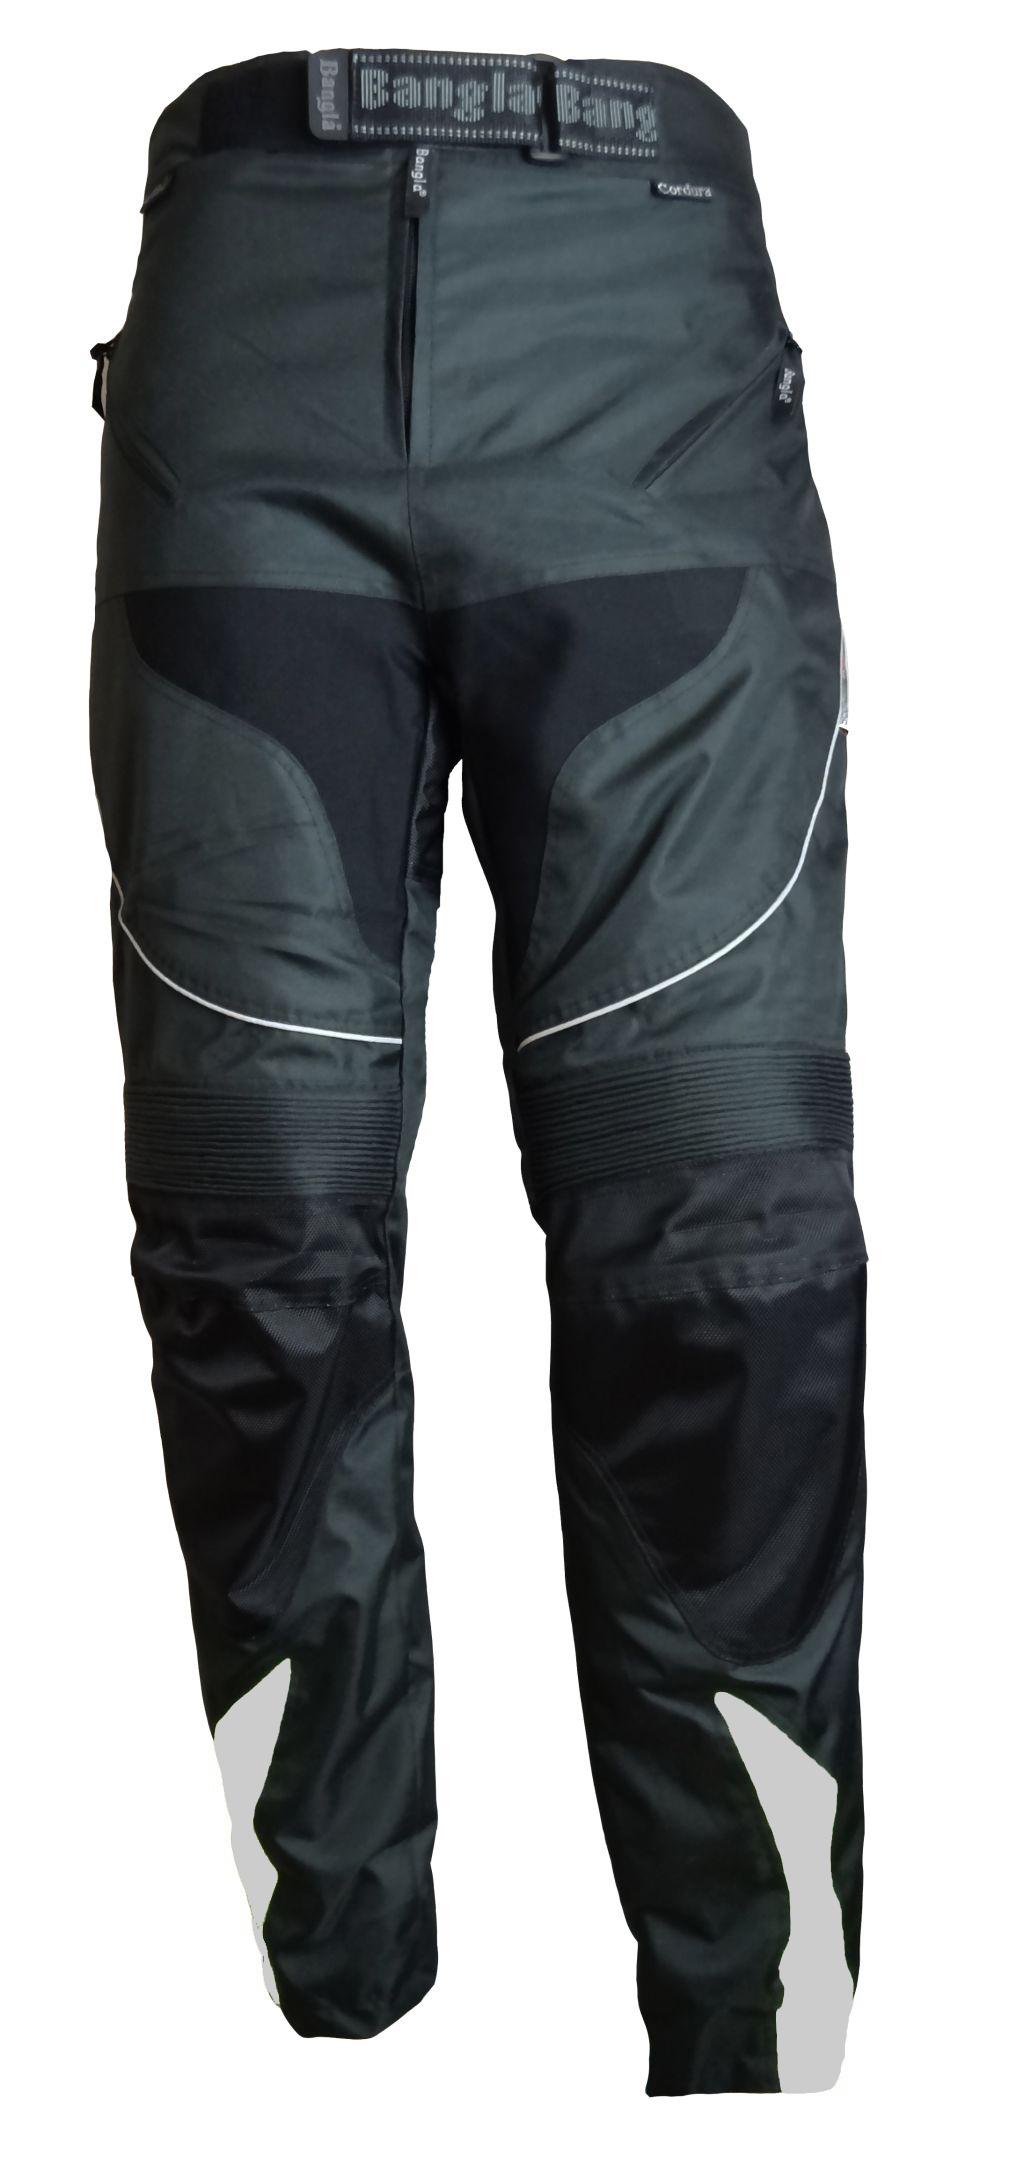 Bangla Motorrad Hose Motorradhose Textil Cordura schwarz mit grau S - 7 XL